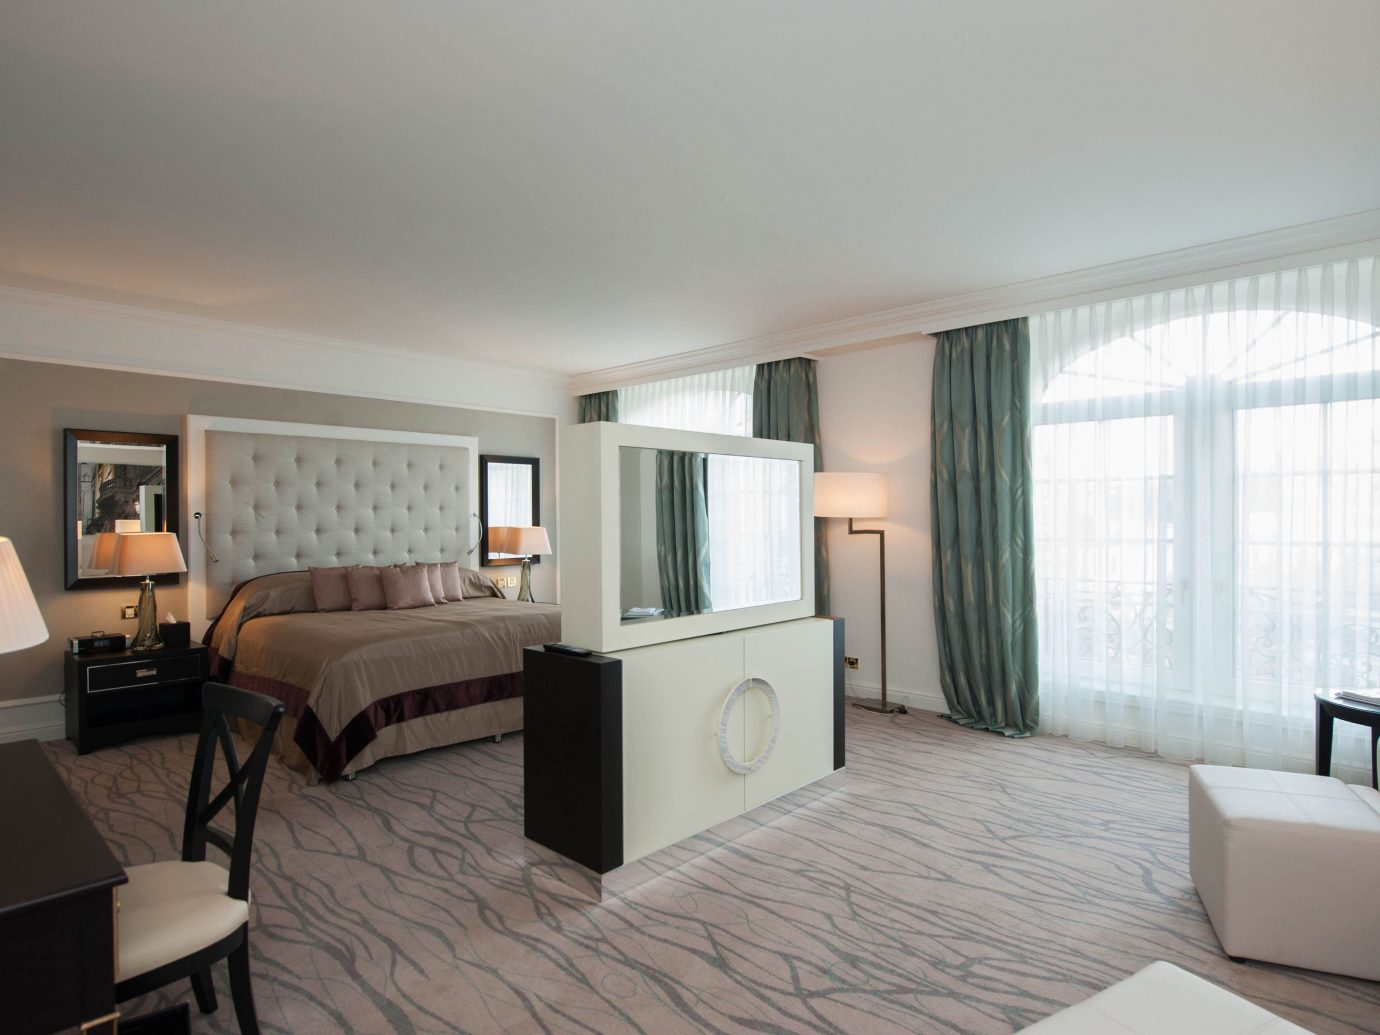 Bedroom at Steigenberger Wiltcher